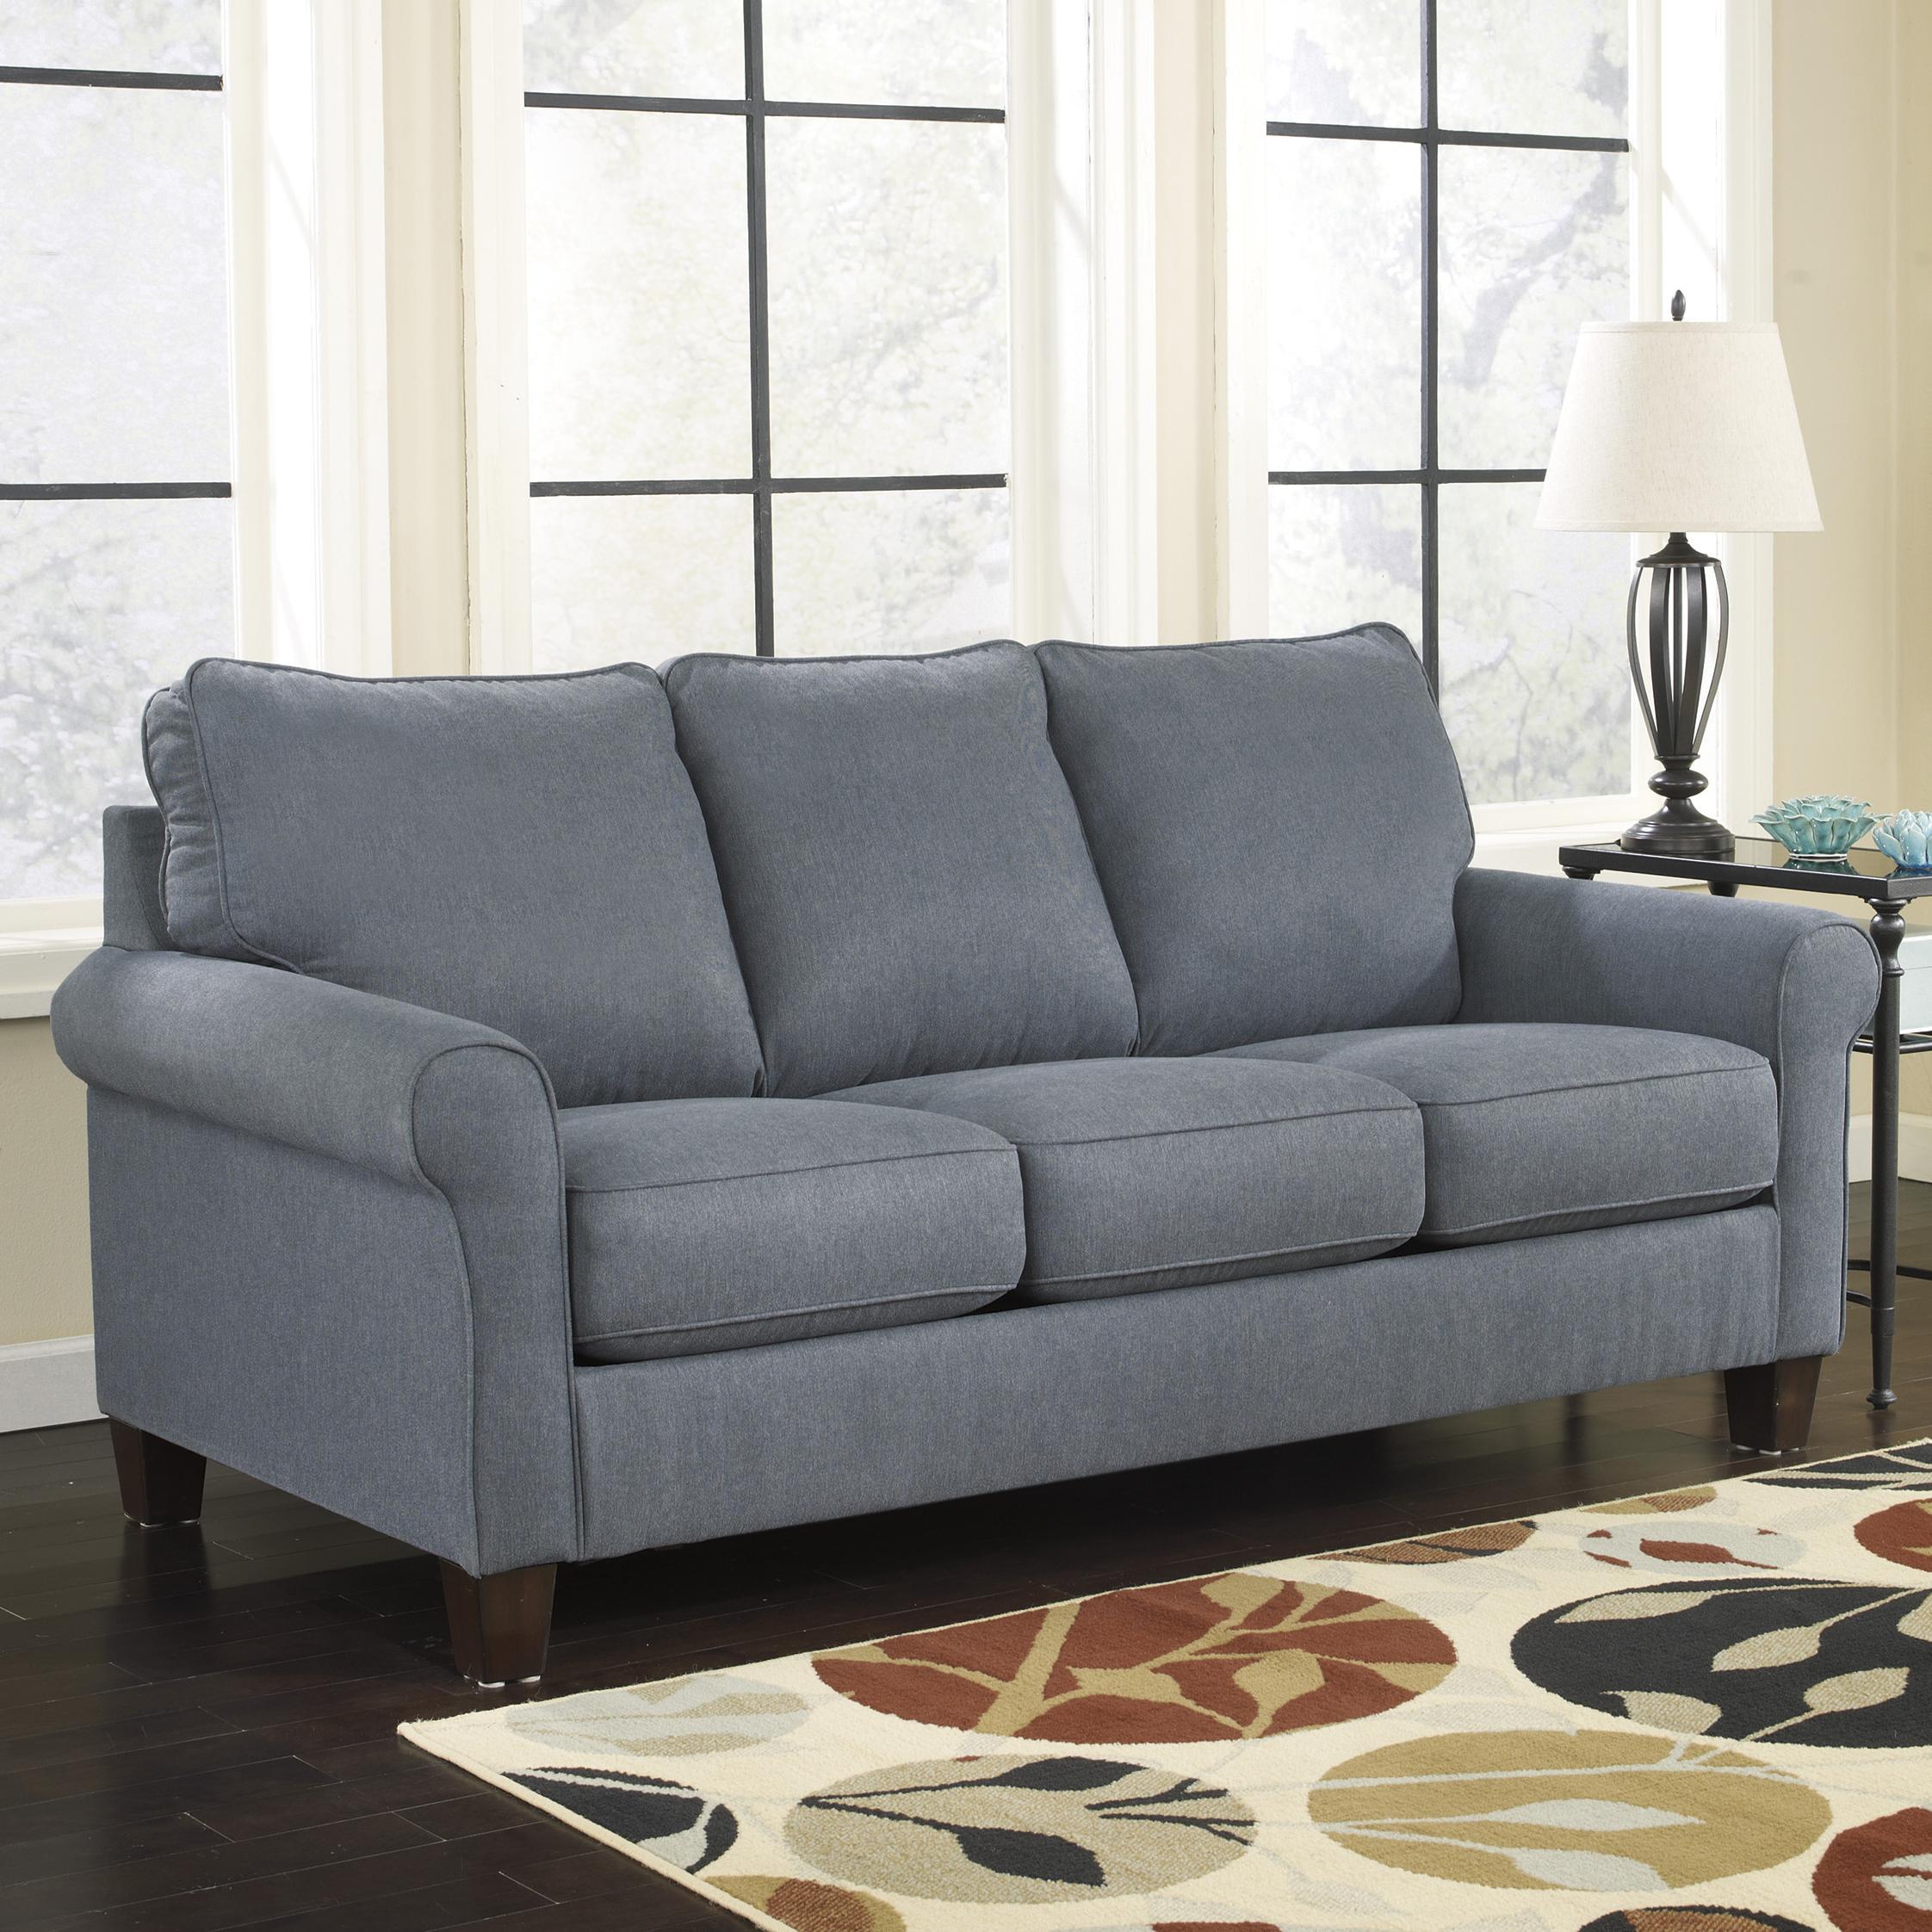 Signature Design By Ashley Zeth   Denim Queen Sofa Sleeper   Item Number:  2710139